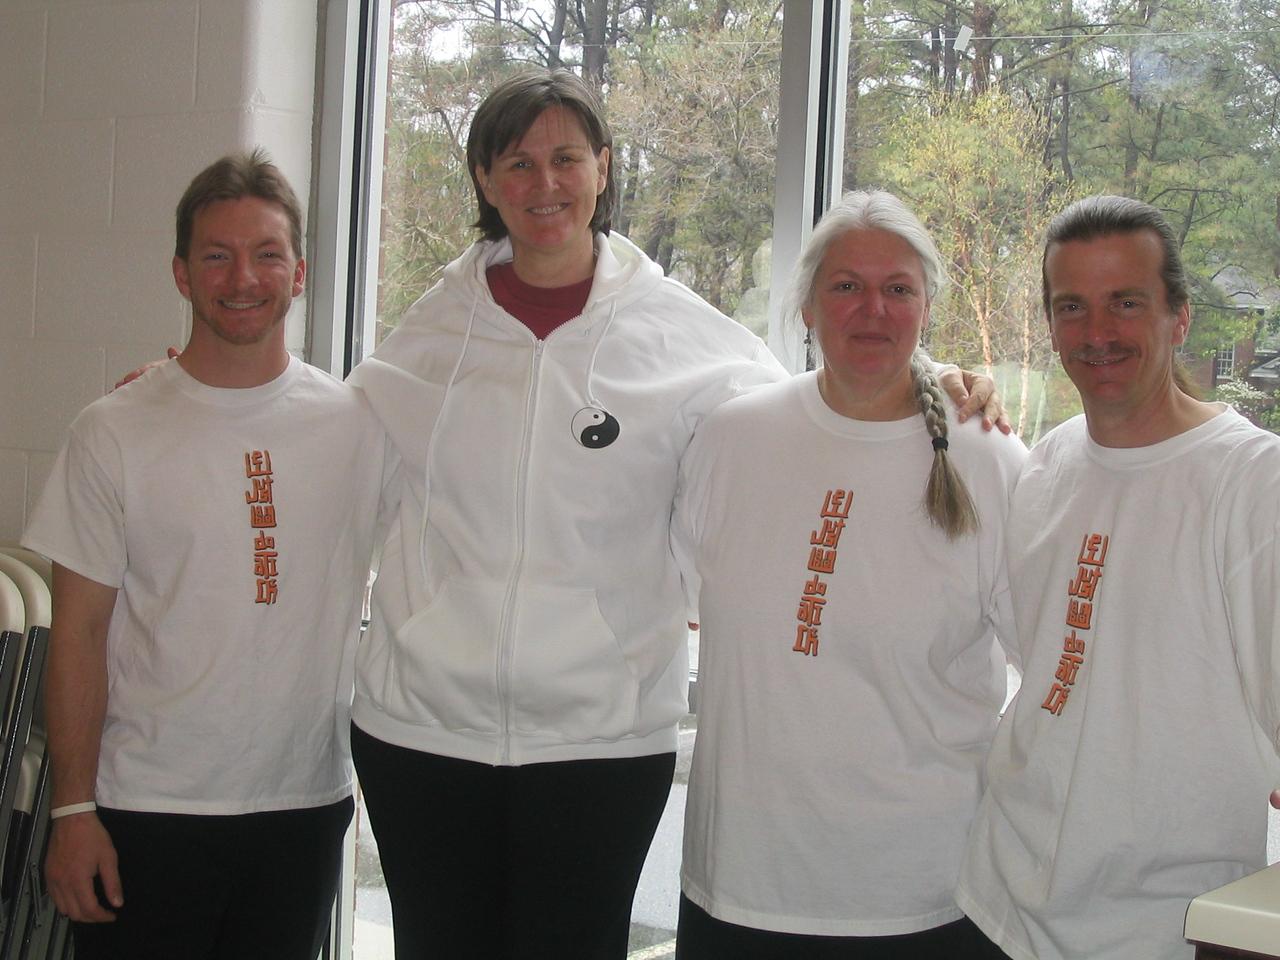 Nik Levinsky, Judith Forsyth-Teacher, Elise Wolf, Tom Wolf. New Dragon Graduates. 11-01-06